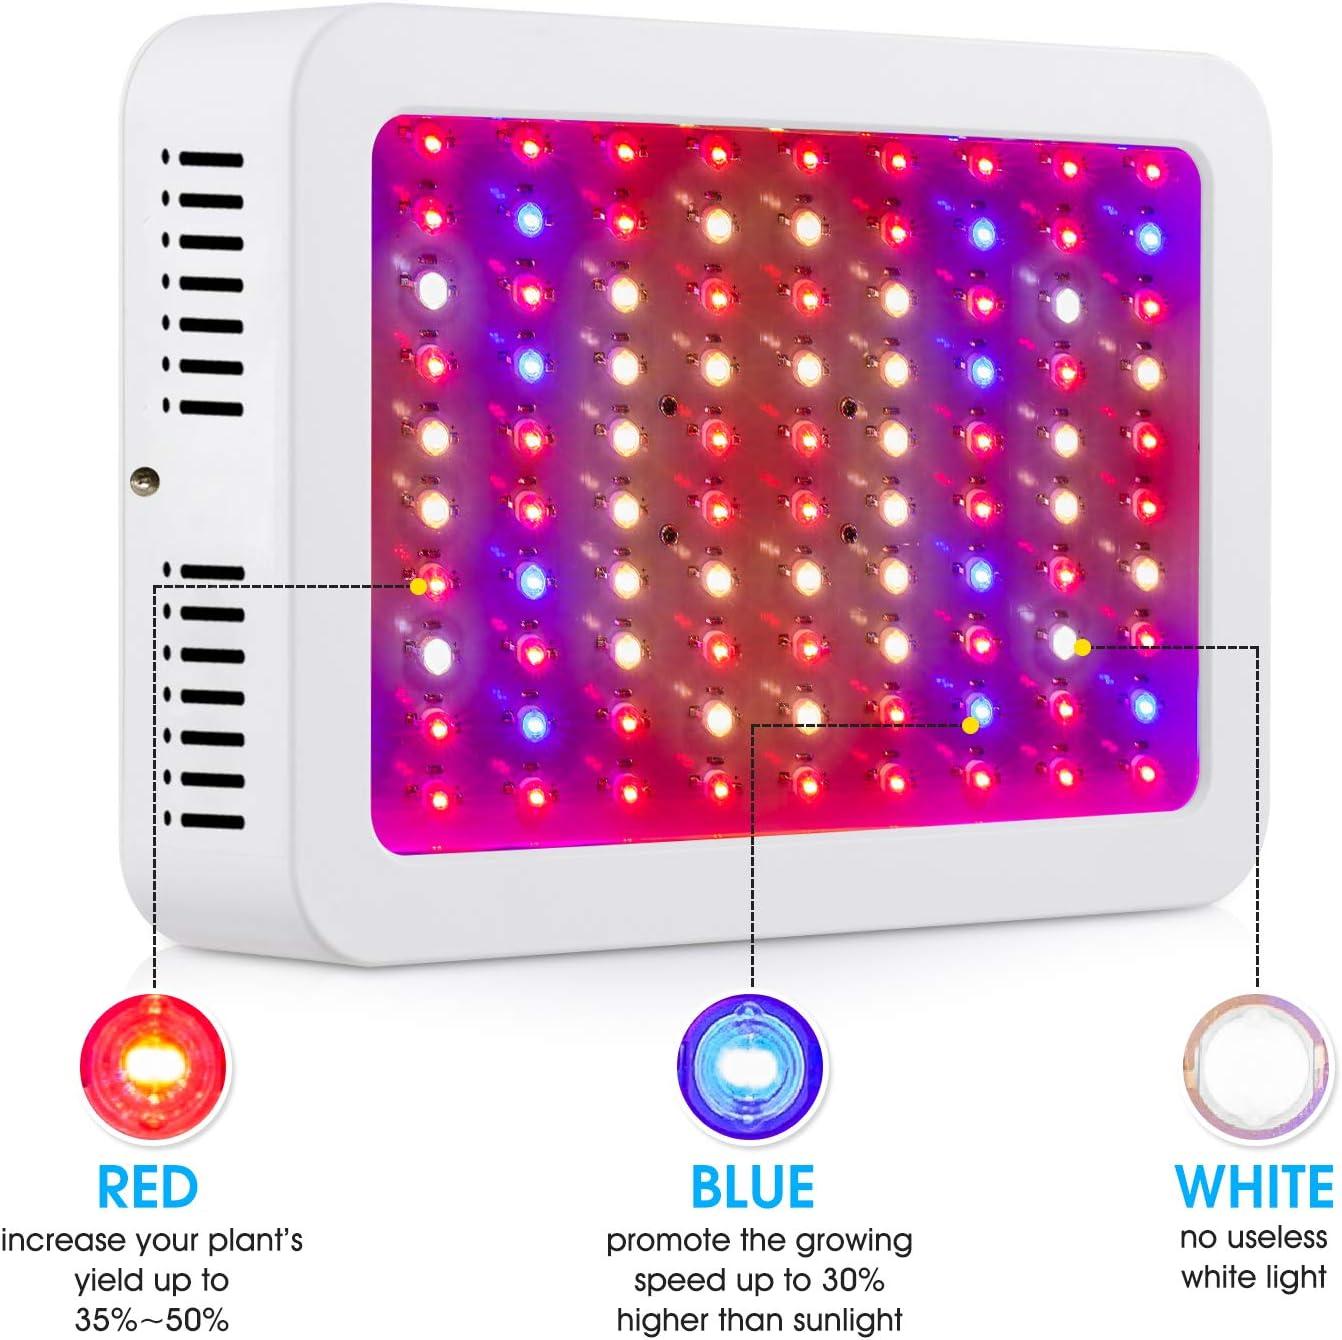 Giixer 1000W LED Grow Light, Dual Switch & Dual Chips Full Spectrum LED Grow Light Hydroponic Indoor Plants Veg and Flower-1000 wattt ( 10W LEDs 100Pcs): Home Improvement